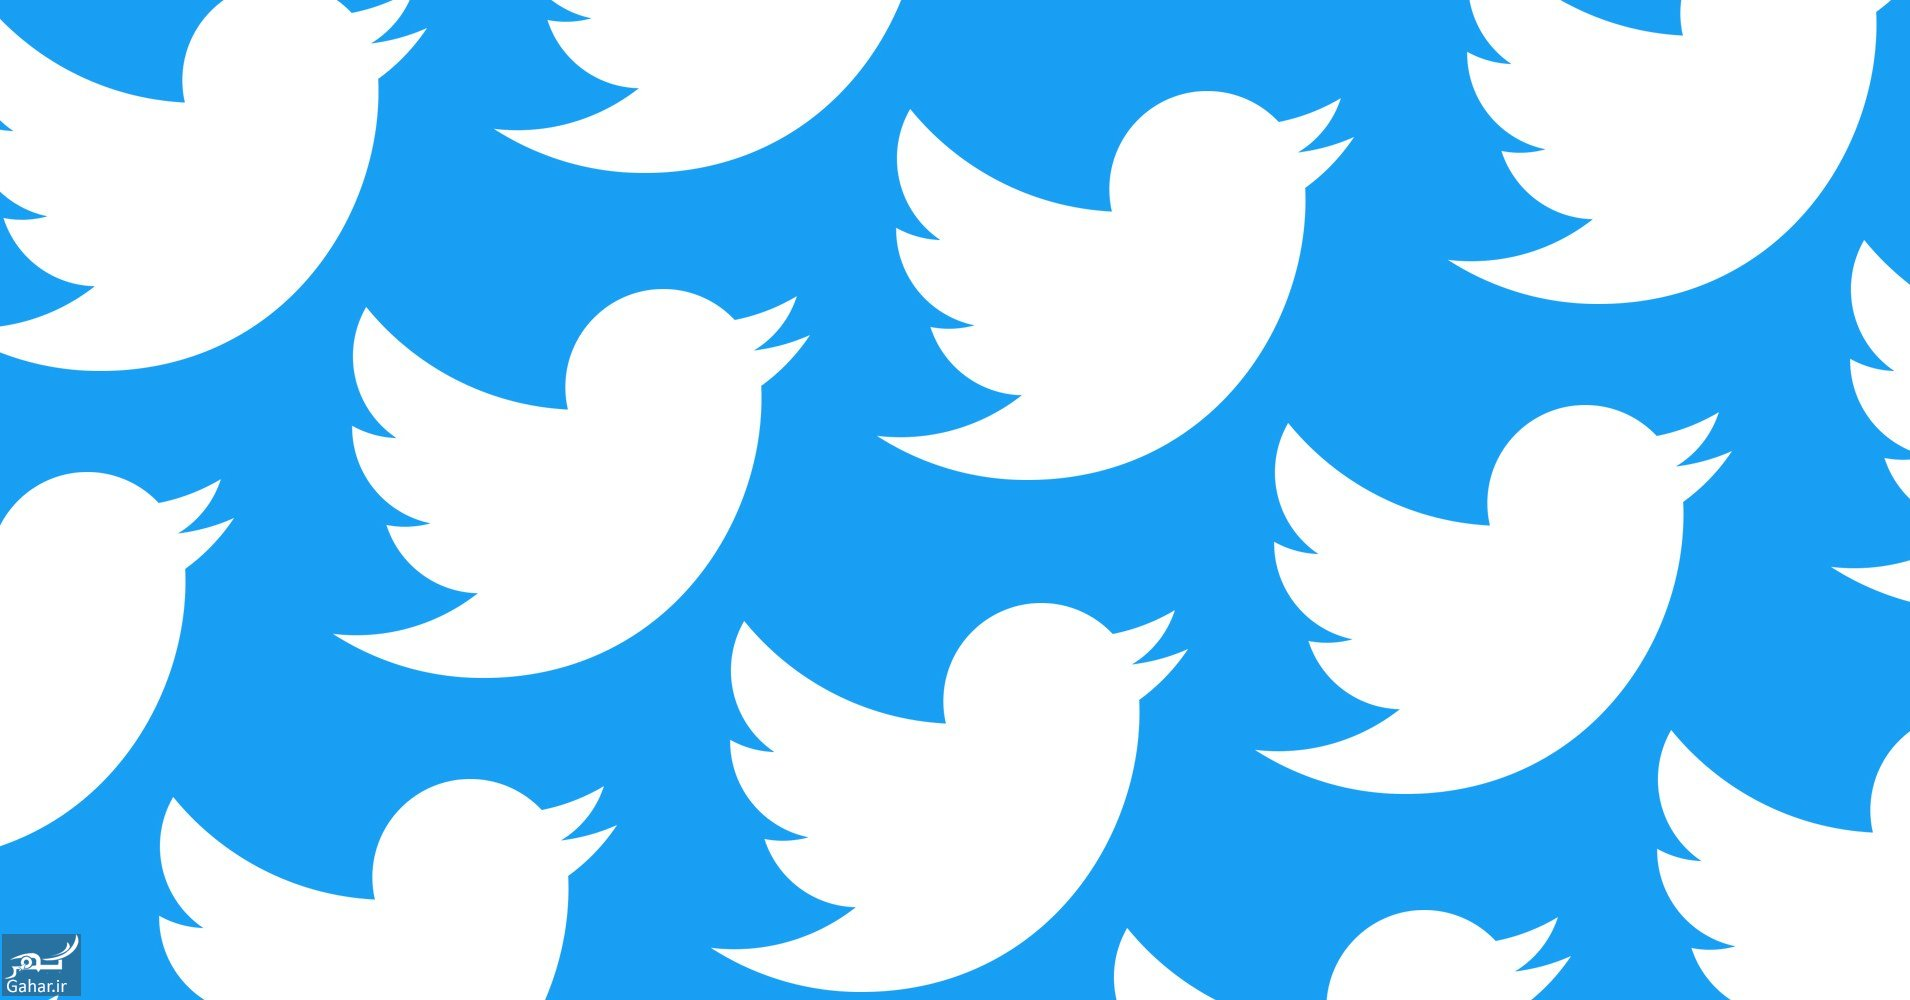 mataleb www.gahar .ir 19.09.97 13 توییتر چیست و چه ویژگی هایی دارد؟